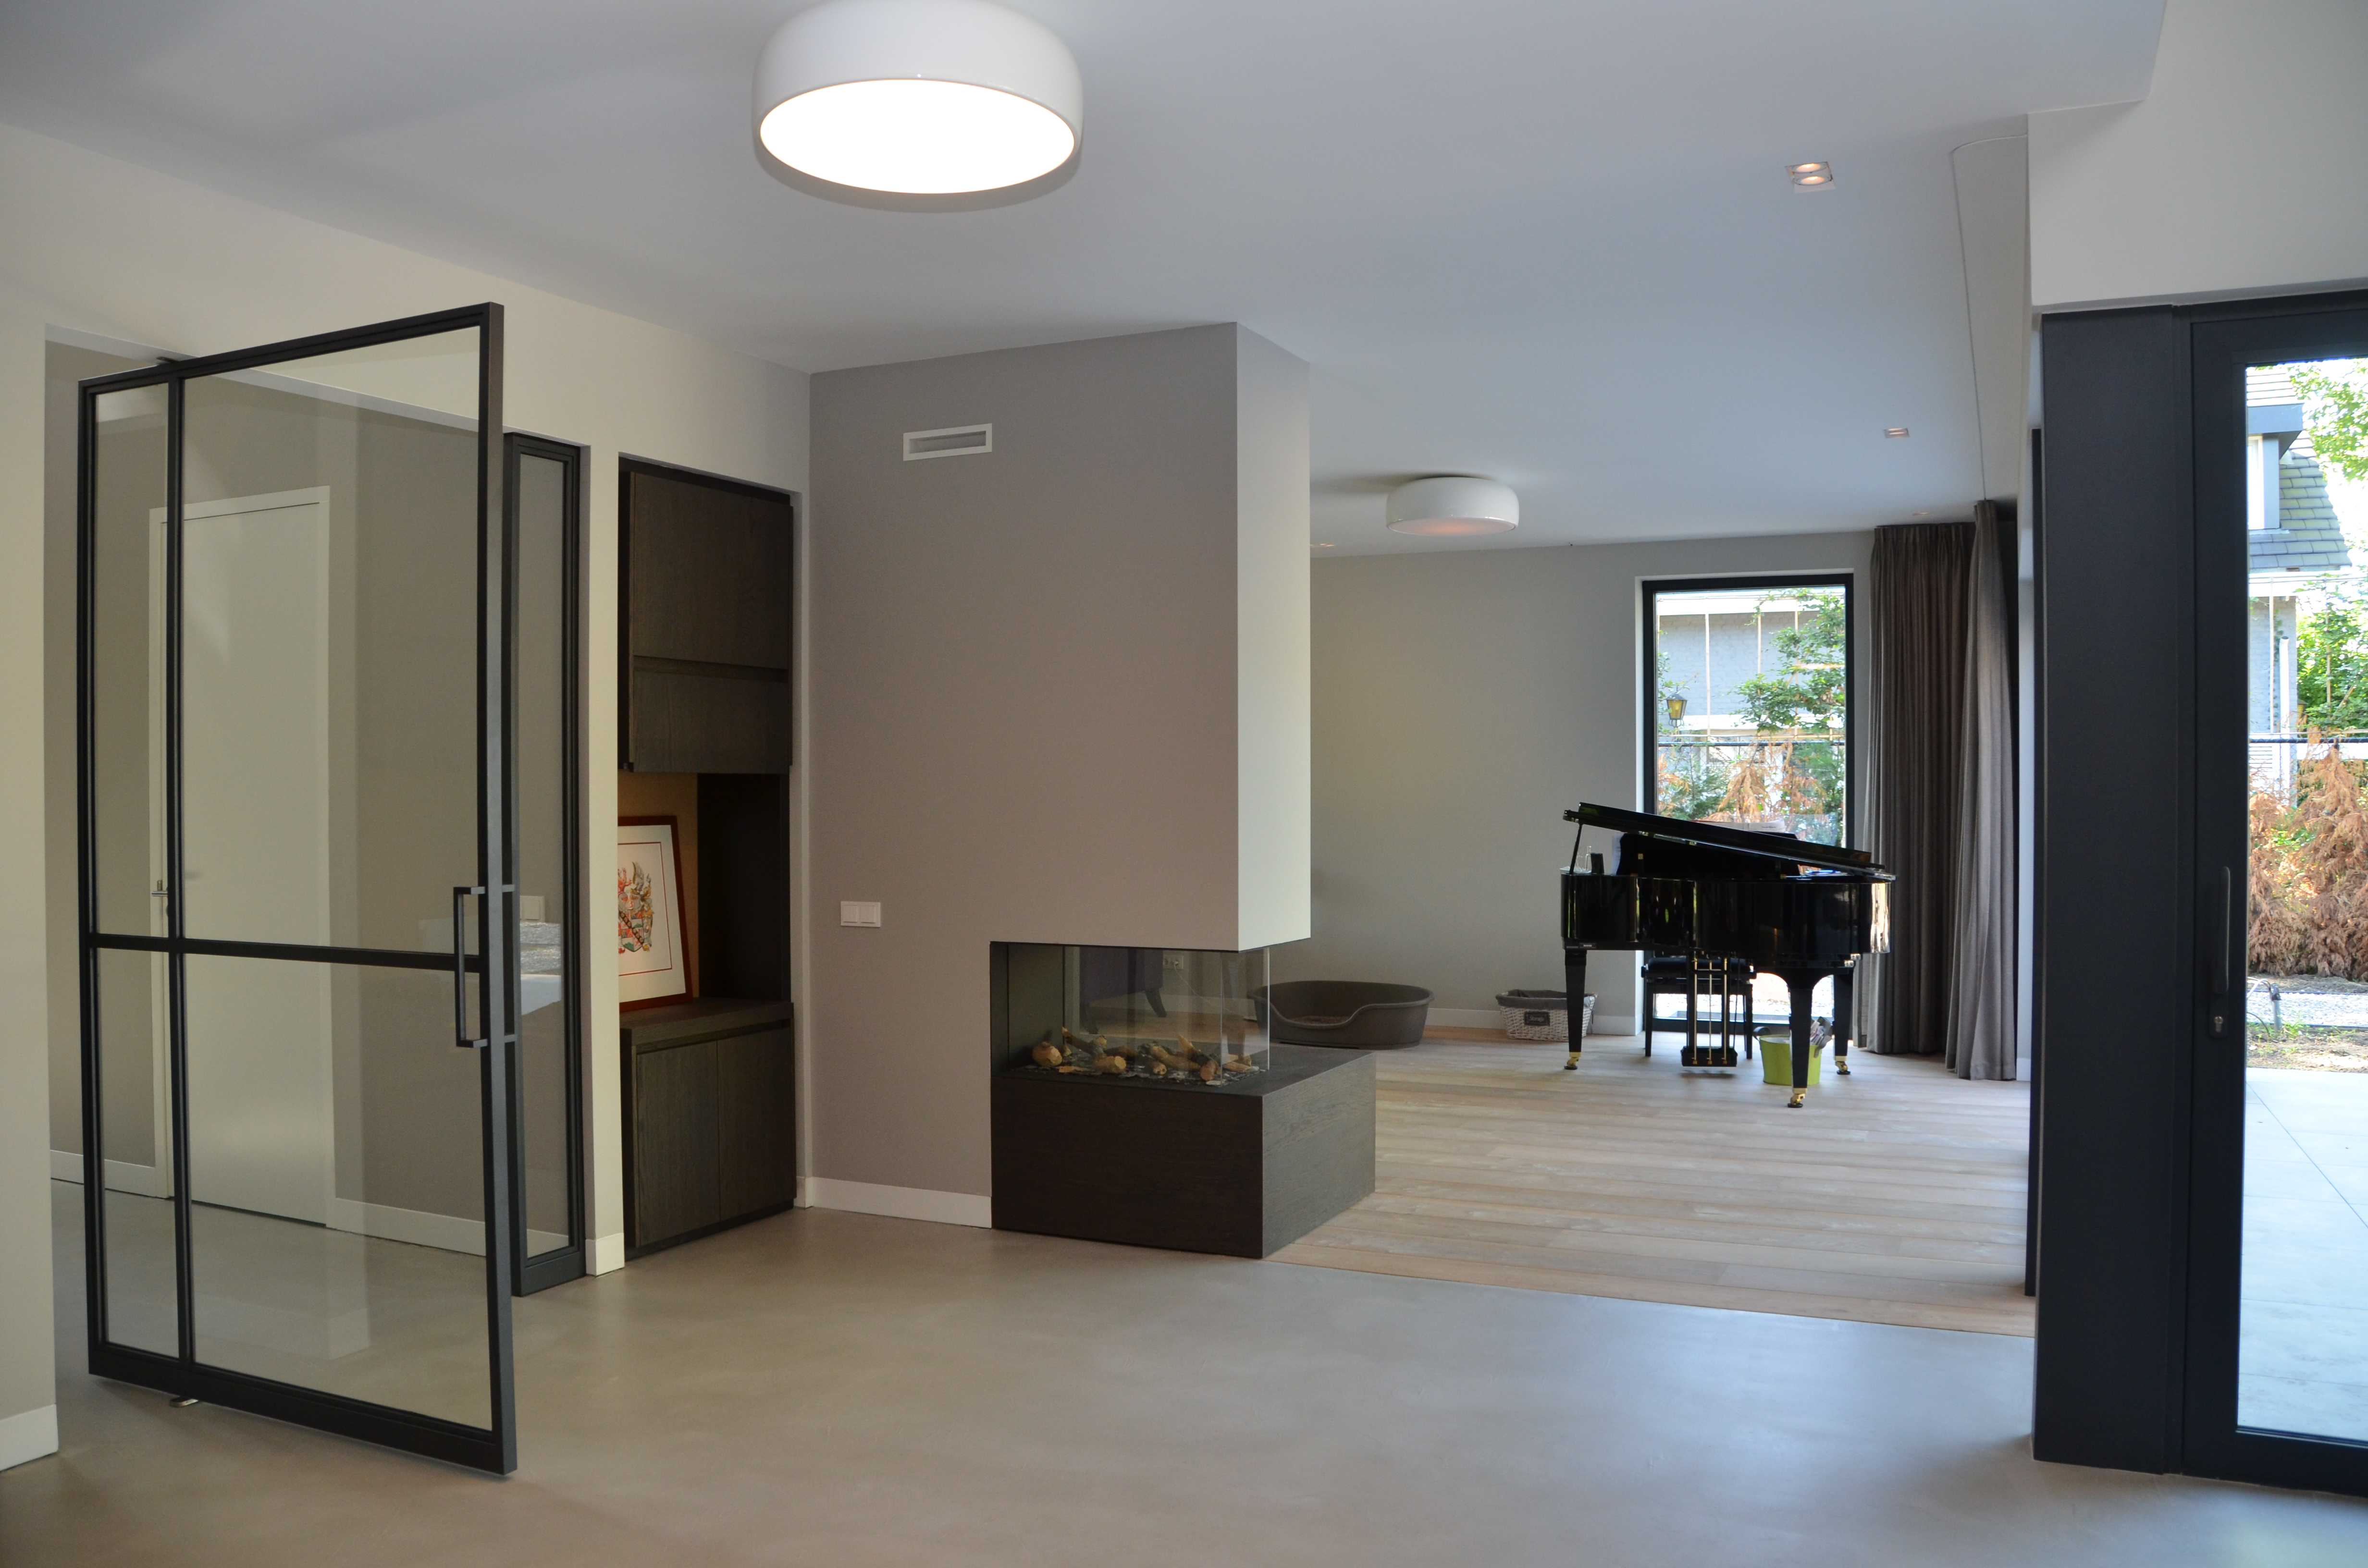 Interieur nieuwbouw villa u architectenbureau drijvers oisterwijk b v